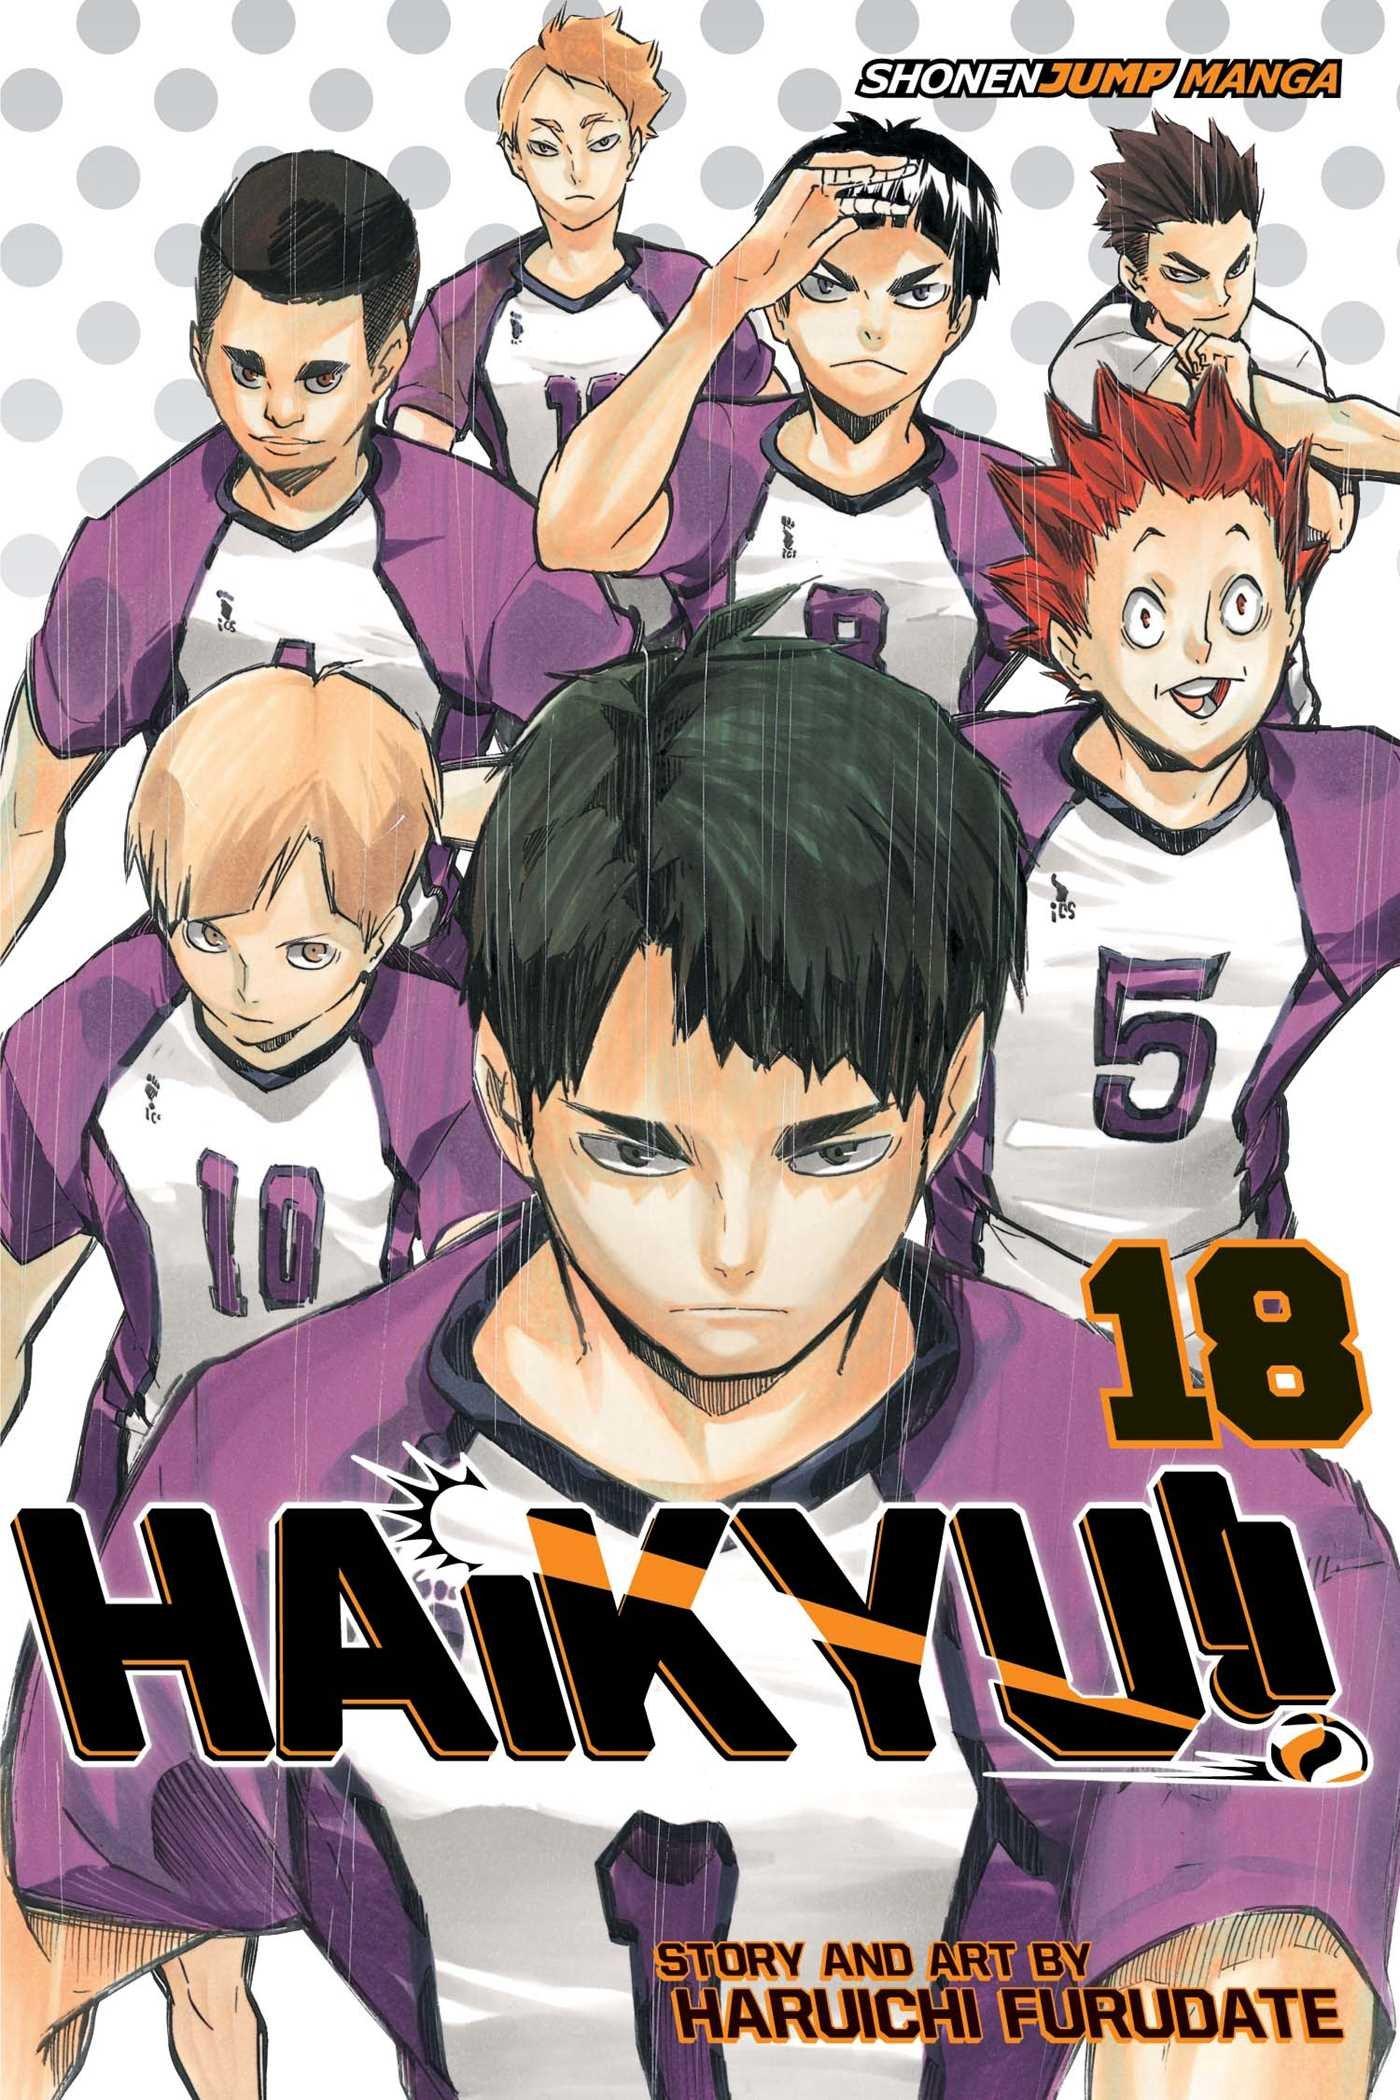 Haikyu!! - Tomo 18 - Haruichi Furudate - Manga ( Ingles)